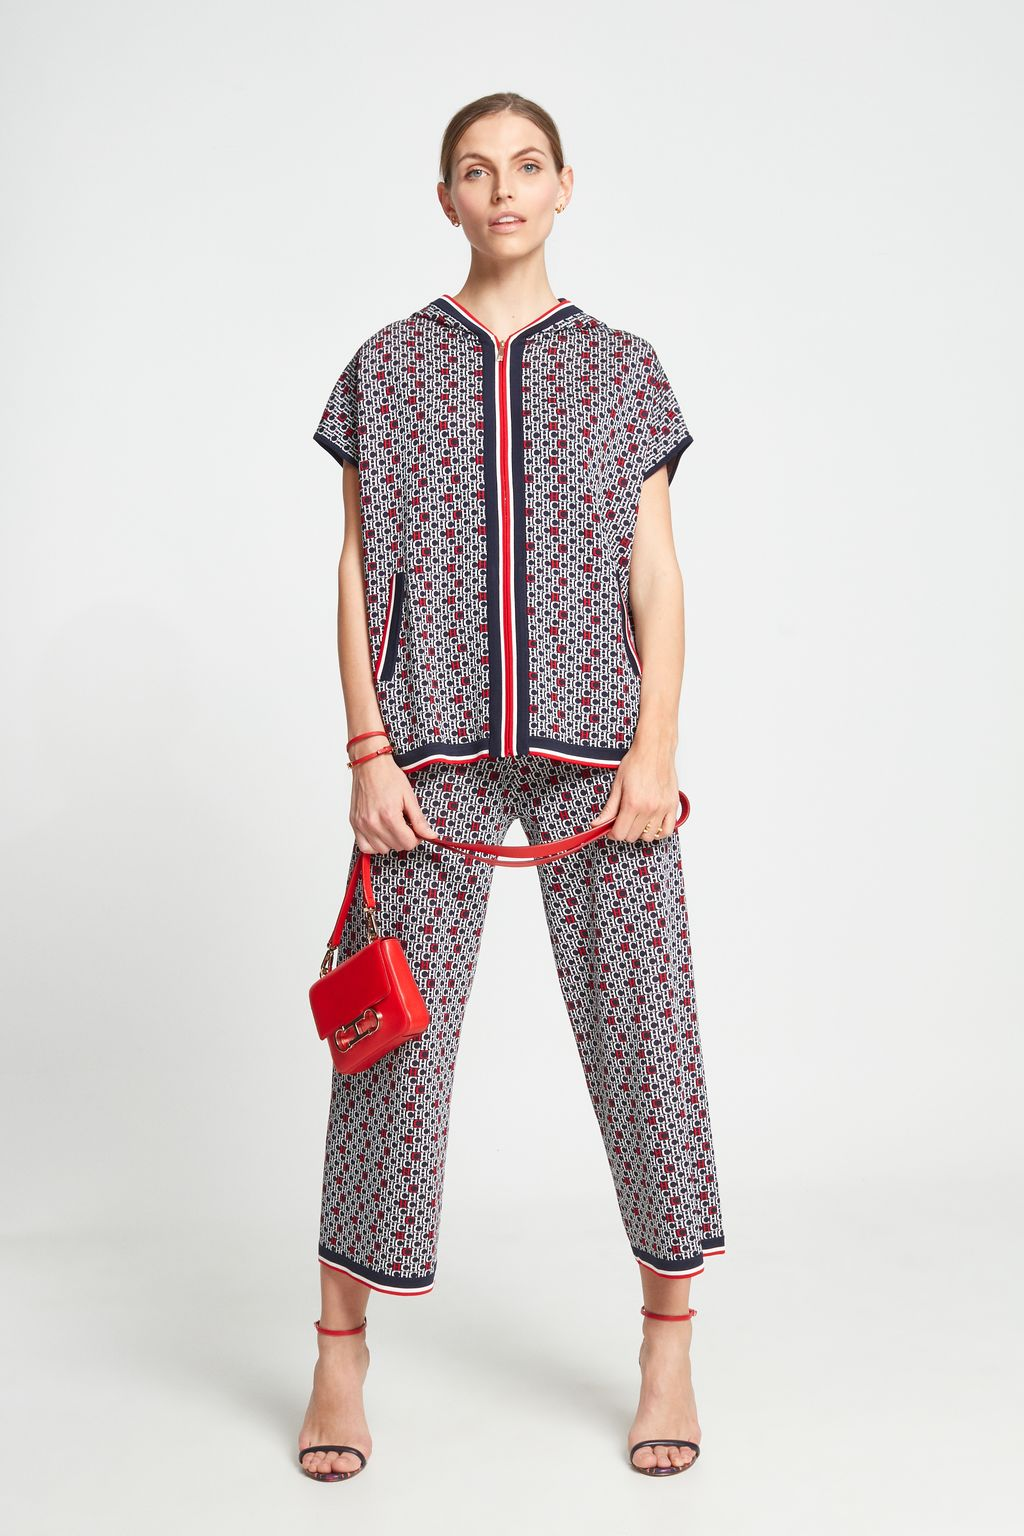 CH jacquard trousers